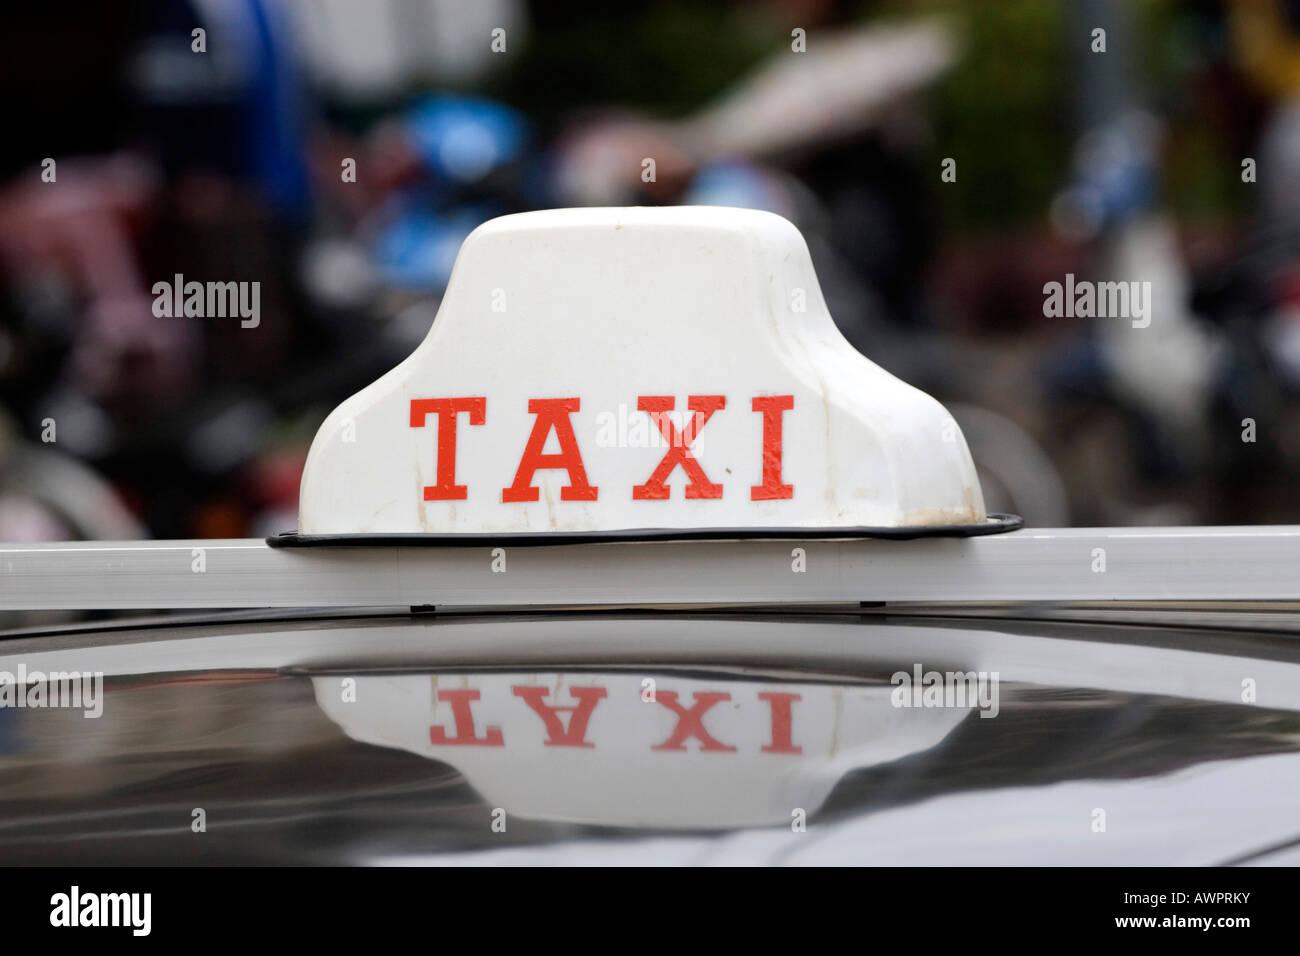 Taxi, Vietnam, Asia - Stock Image